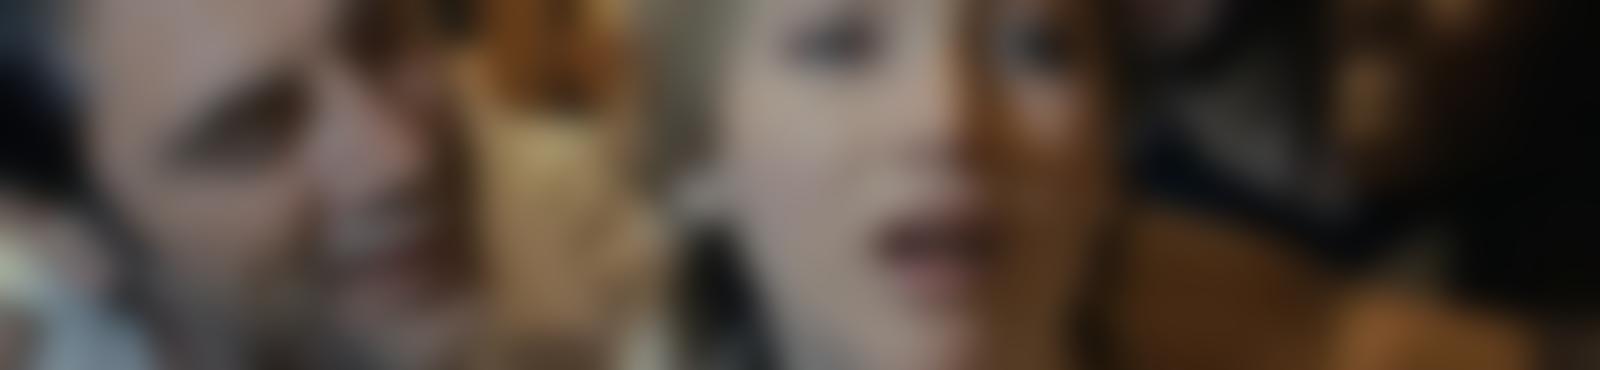 Blurred 860be015 cf7f 448f bc2a 4aa29852214a